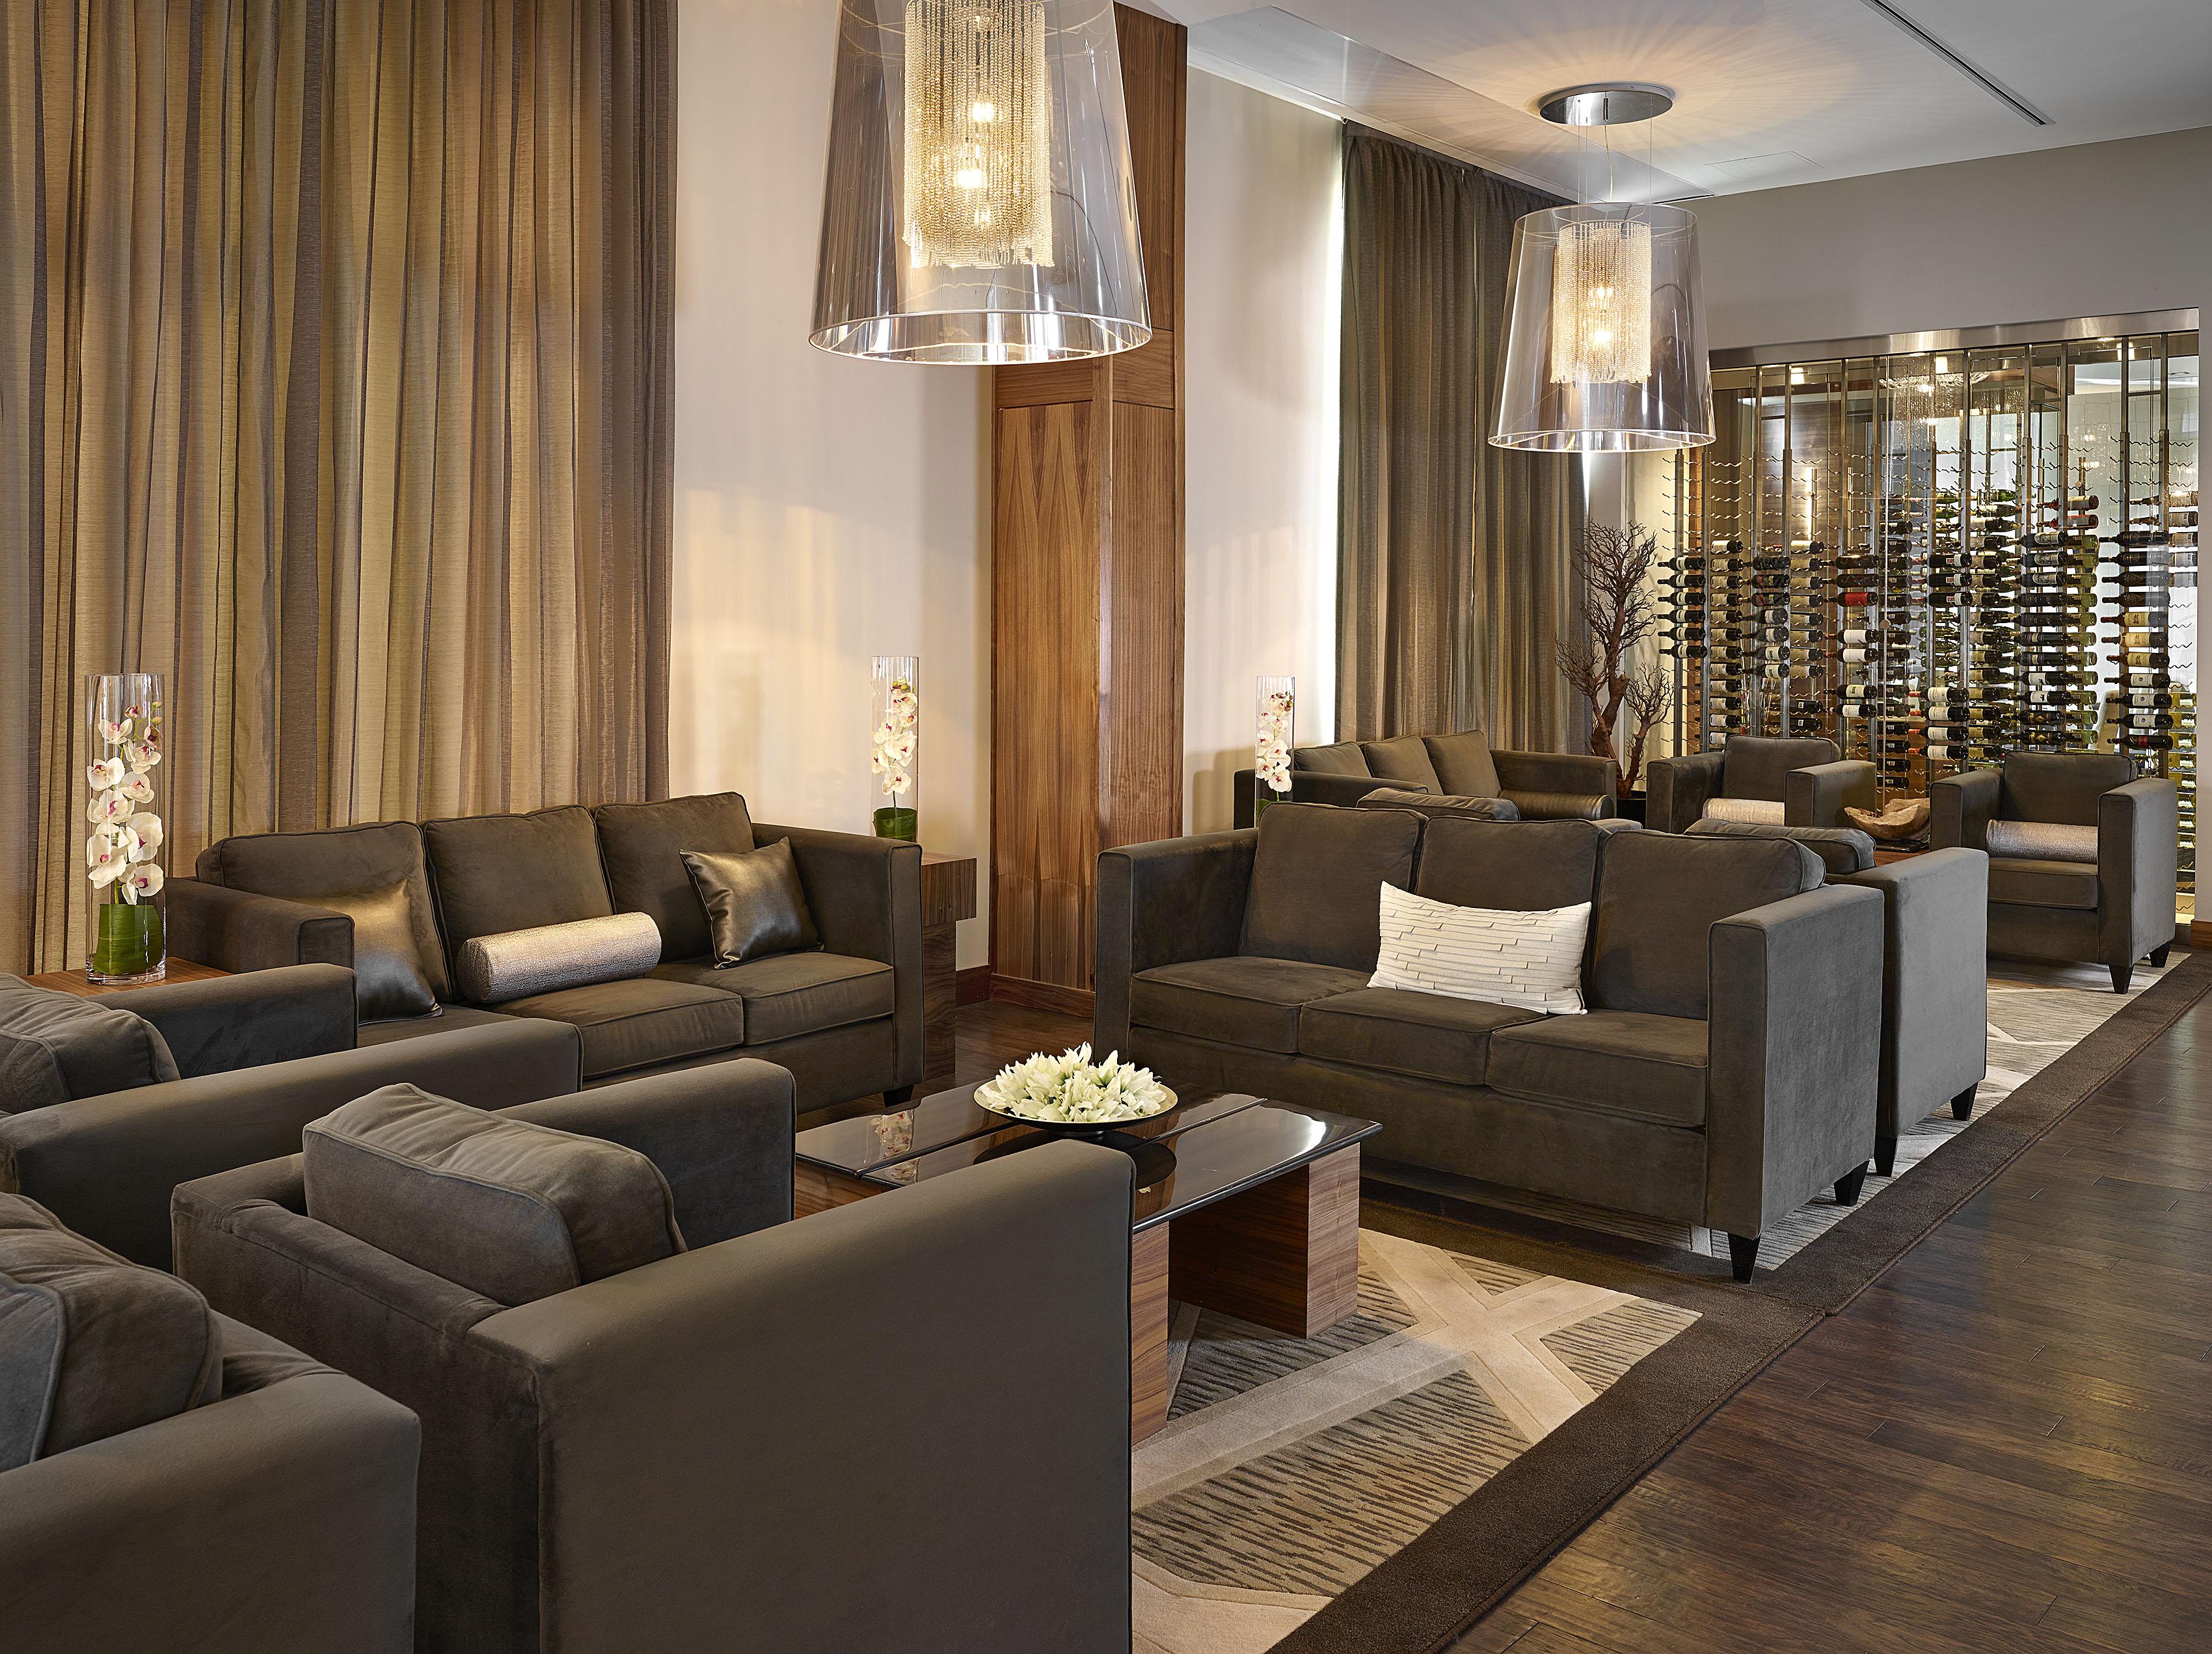 2015 ida awards of excellence jennifer jordan interior for Interior design edmonton